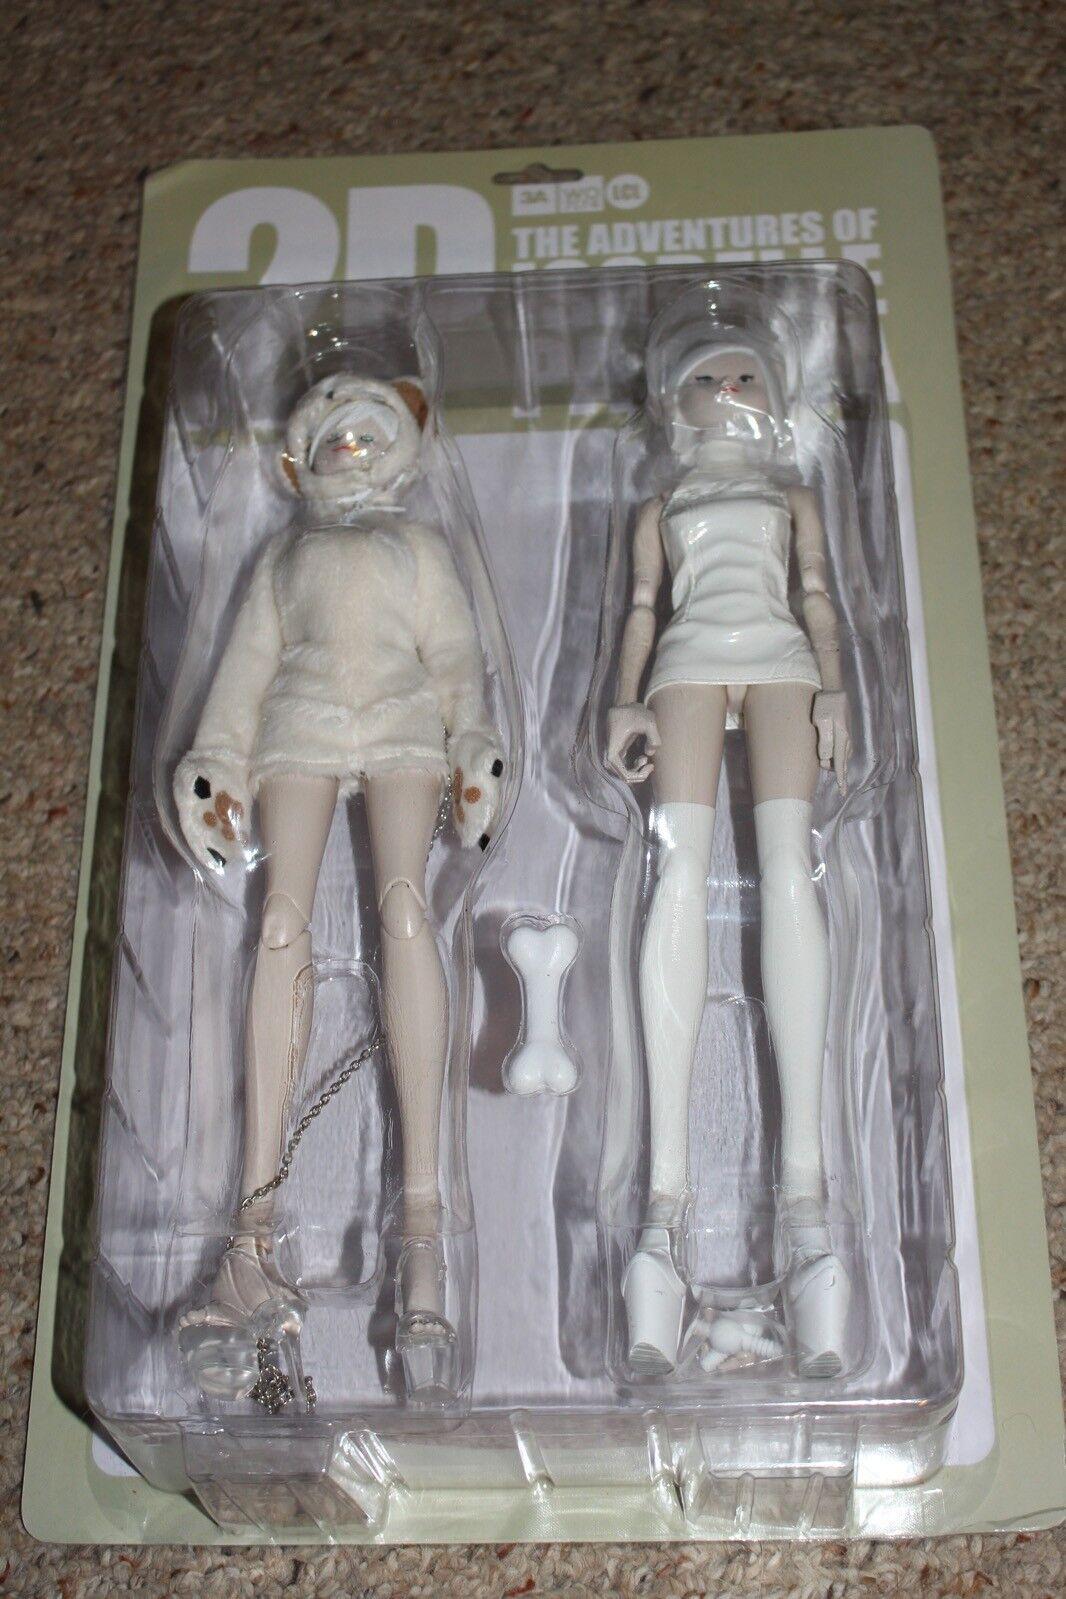 3A ThreeA Lab-Ra-Dore Set Adventures Of Isobelle Pascha Figure Complete